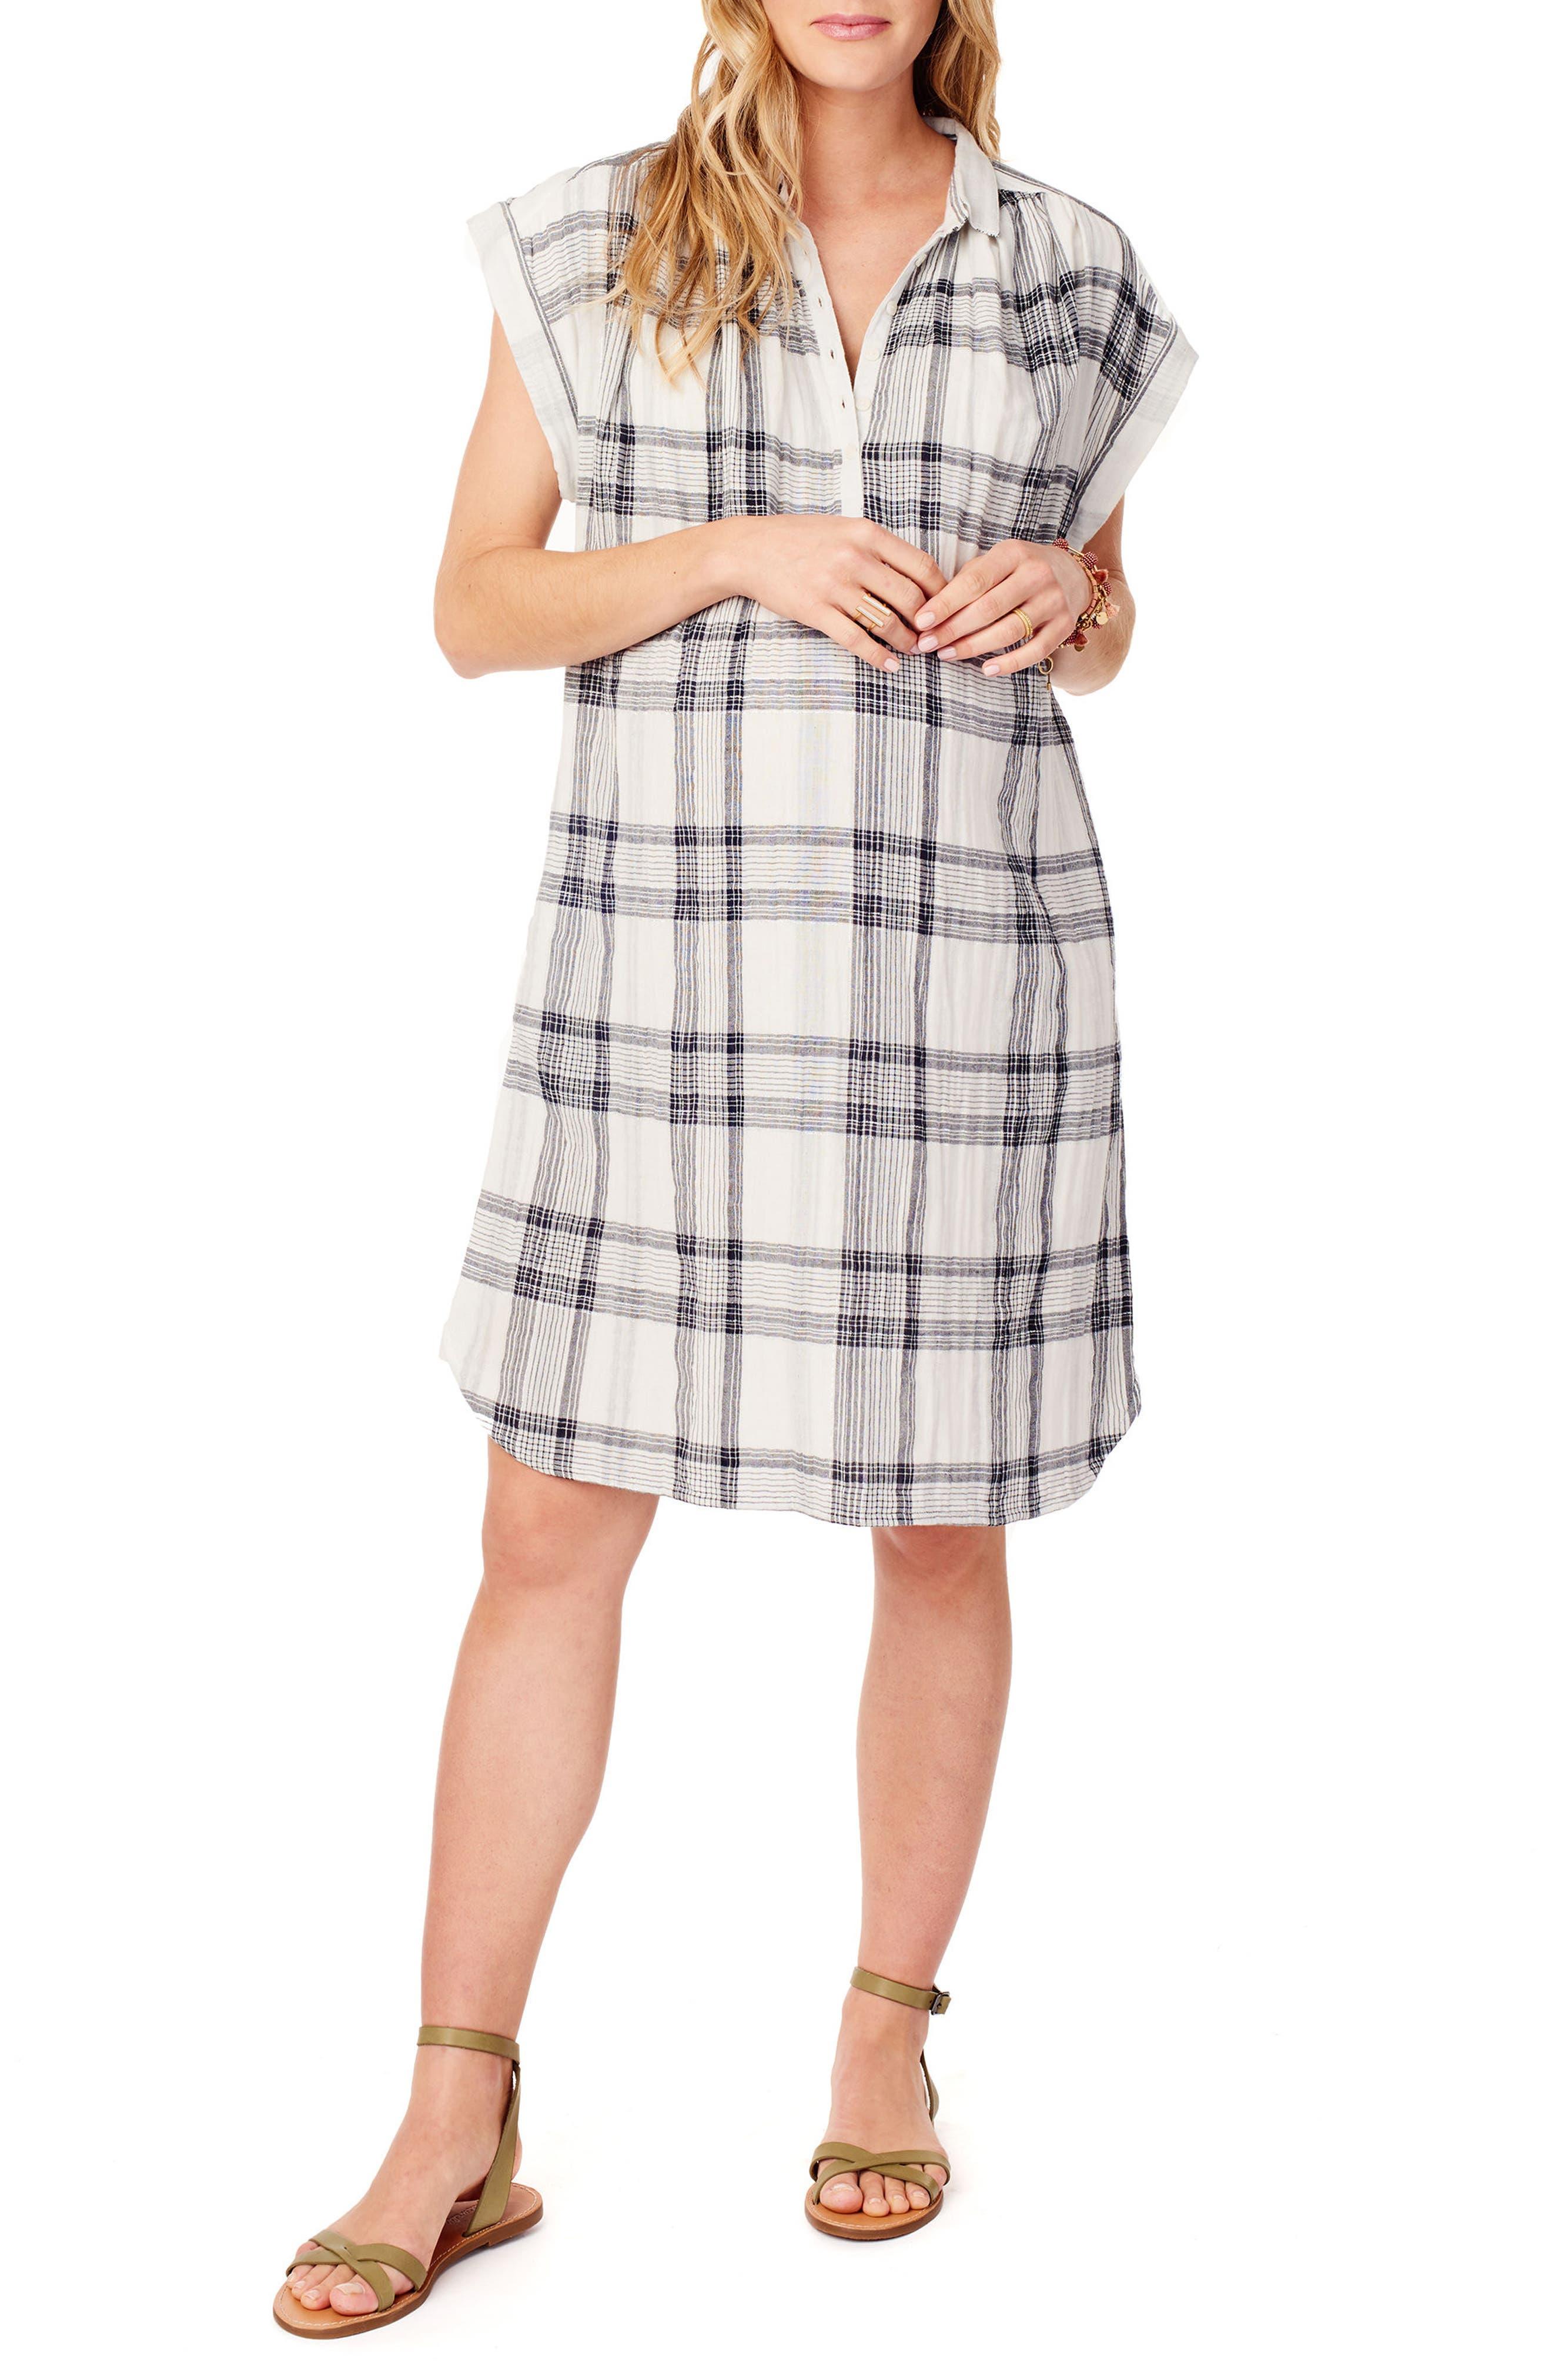 Ingrid & Isabel Maternity Shift Dress,                         Main,                         color, WHITE/ BLACK LUREX PLAID